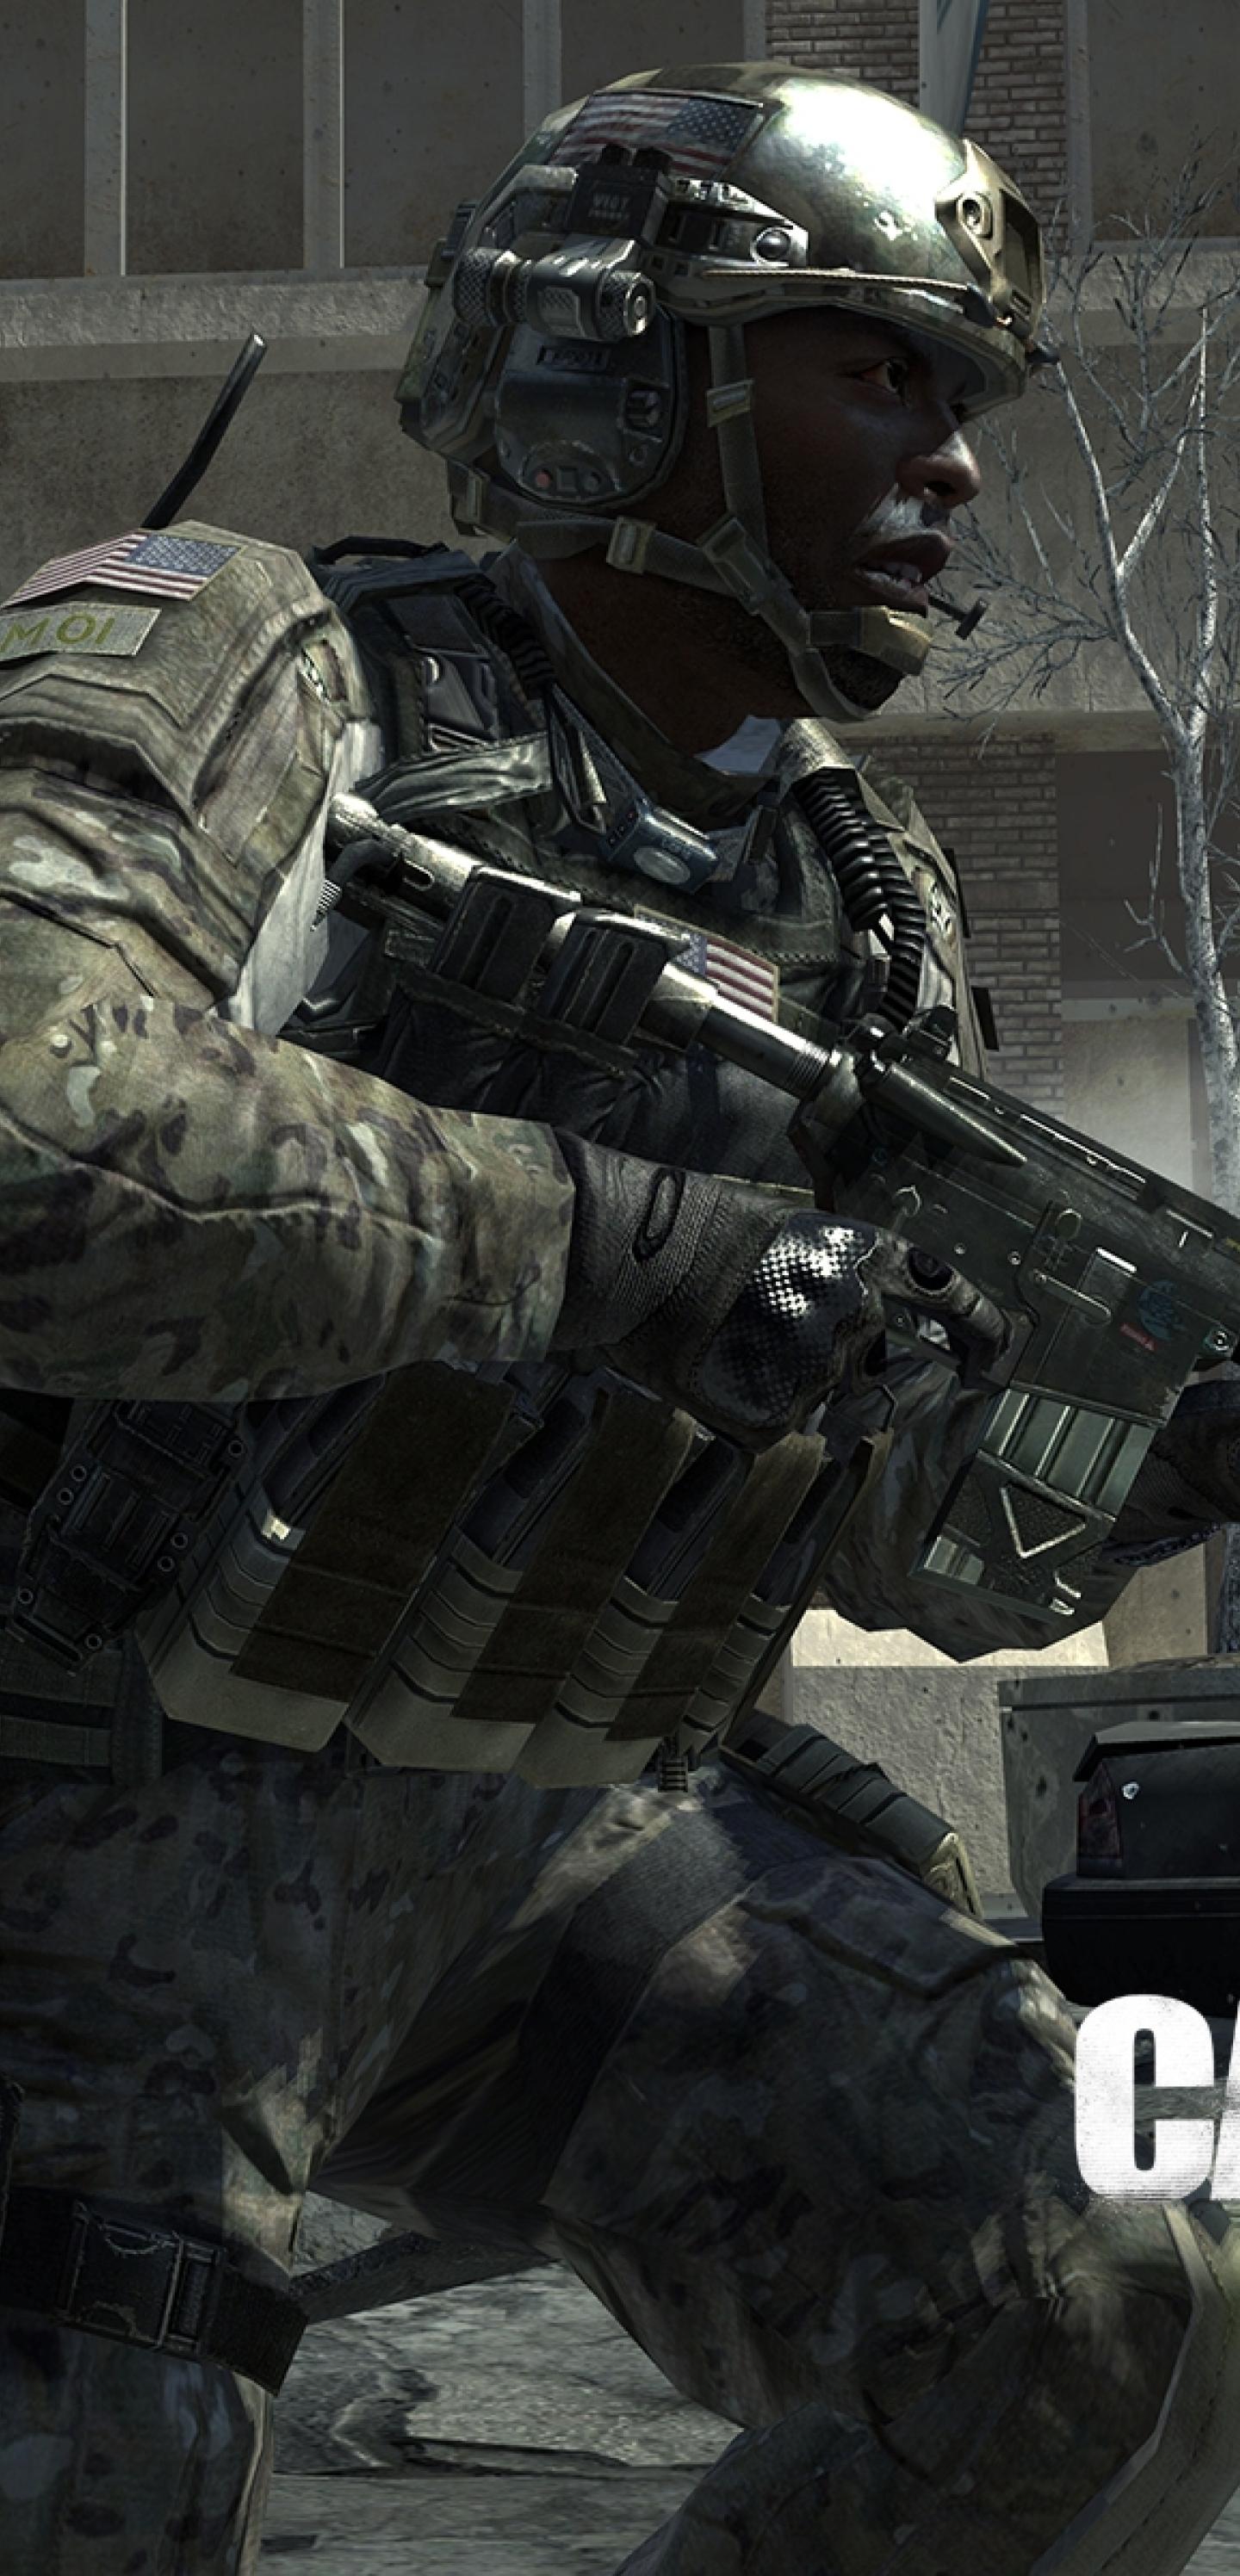 1440x2992 Call Of Duty Modern Warfare 3 Soldiers Bank Machines